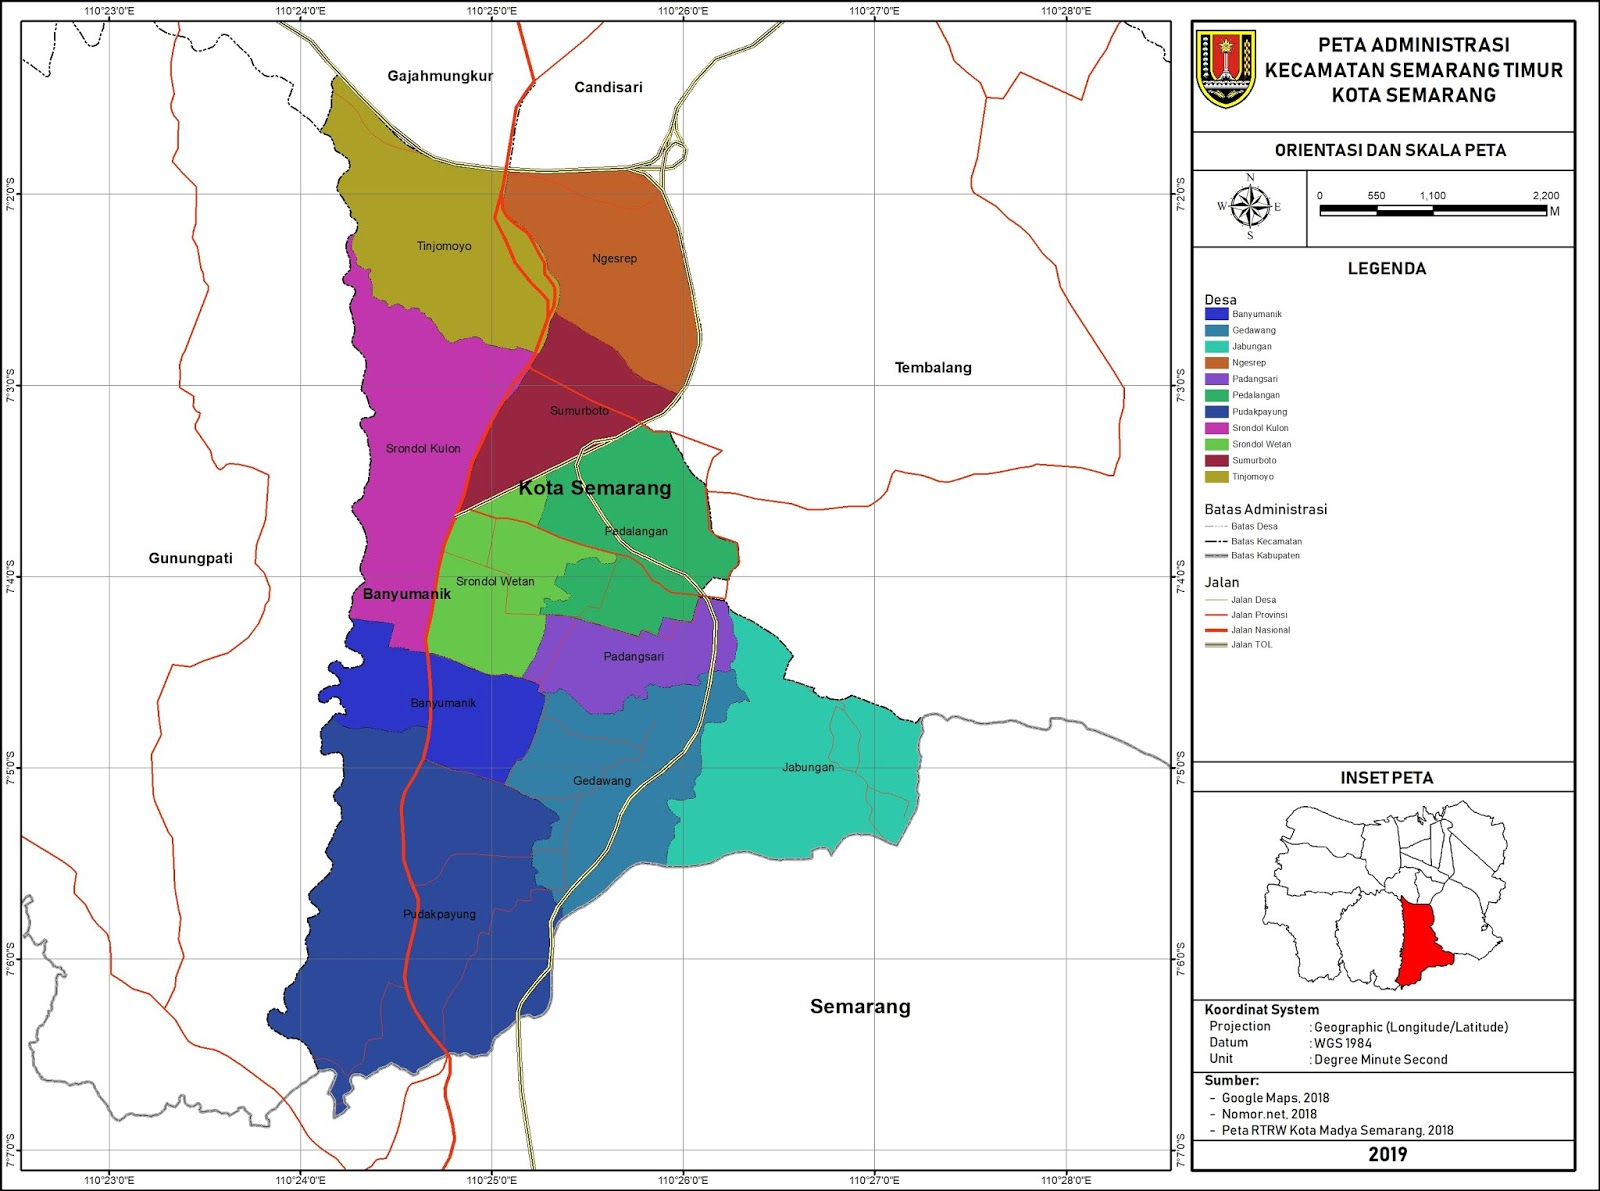 Peta Administrasi Kecamatan Banyumanik, Kota Semarang ...